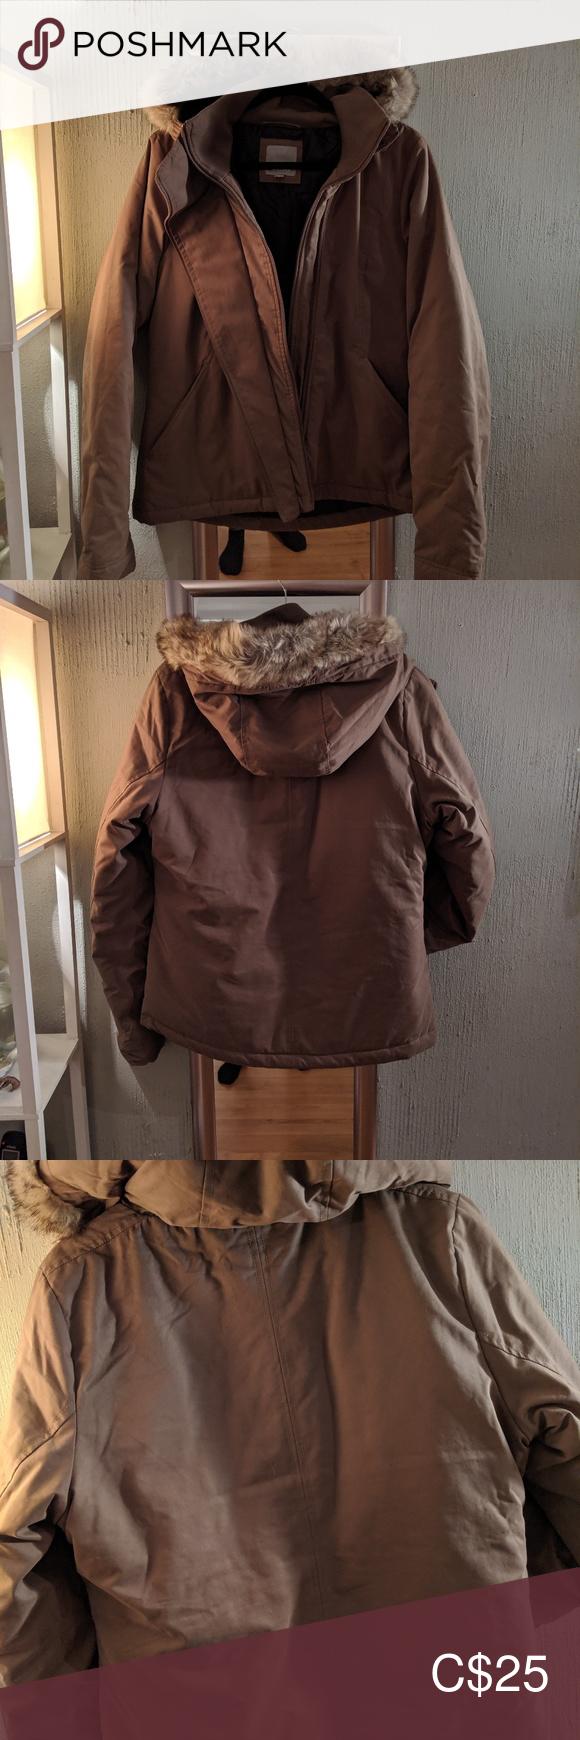 I Just Added This Listing On Poshmark Bench Jacket Shopmycloset Poshmark Fashion Shopping Style Forsale Bench Bench Jackets Jackets For Women Jackets [ 1740 x 580 Pixel ]